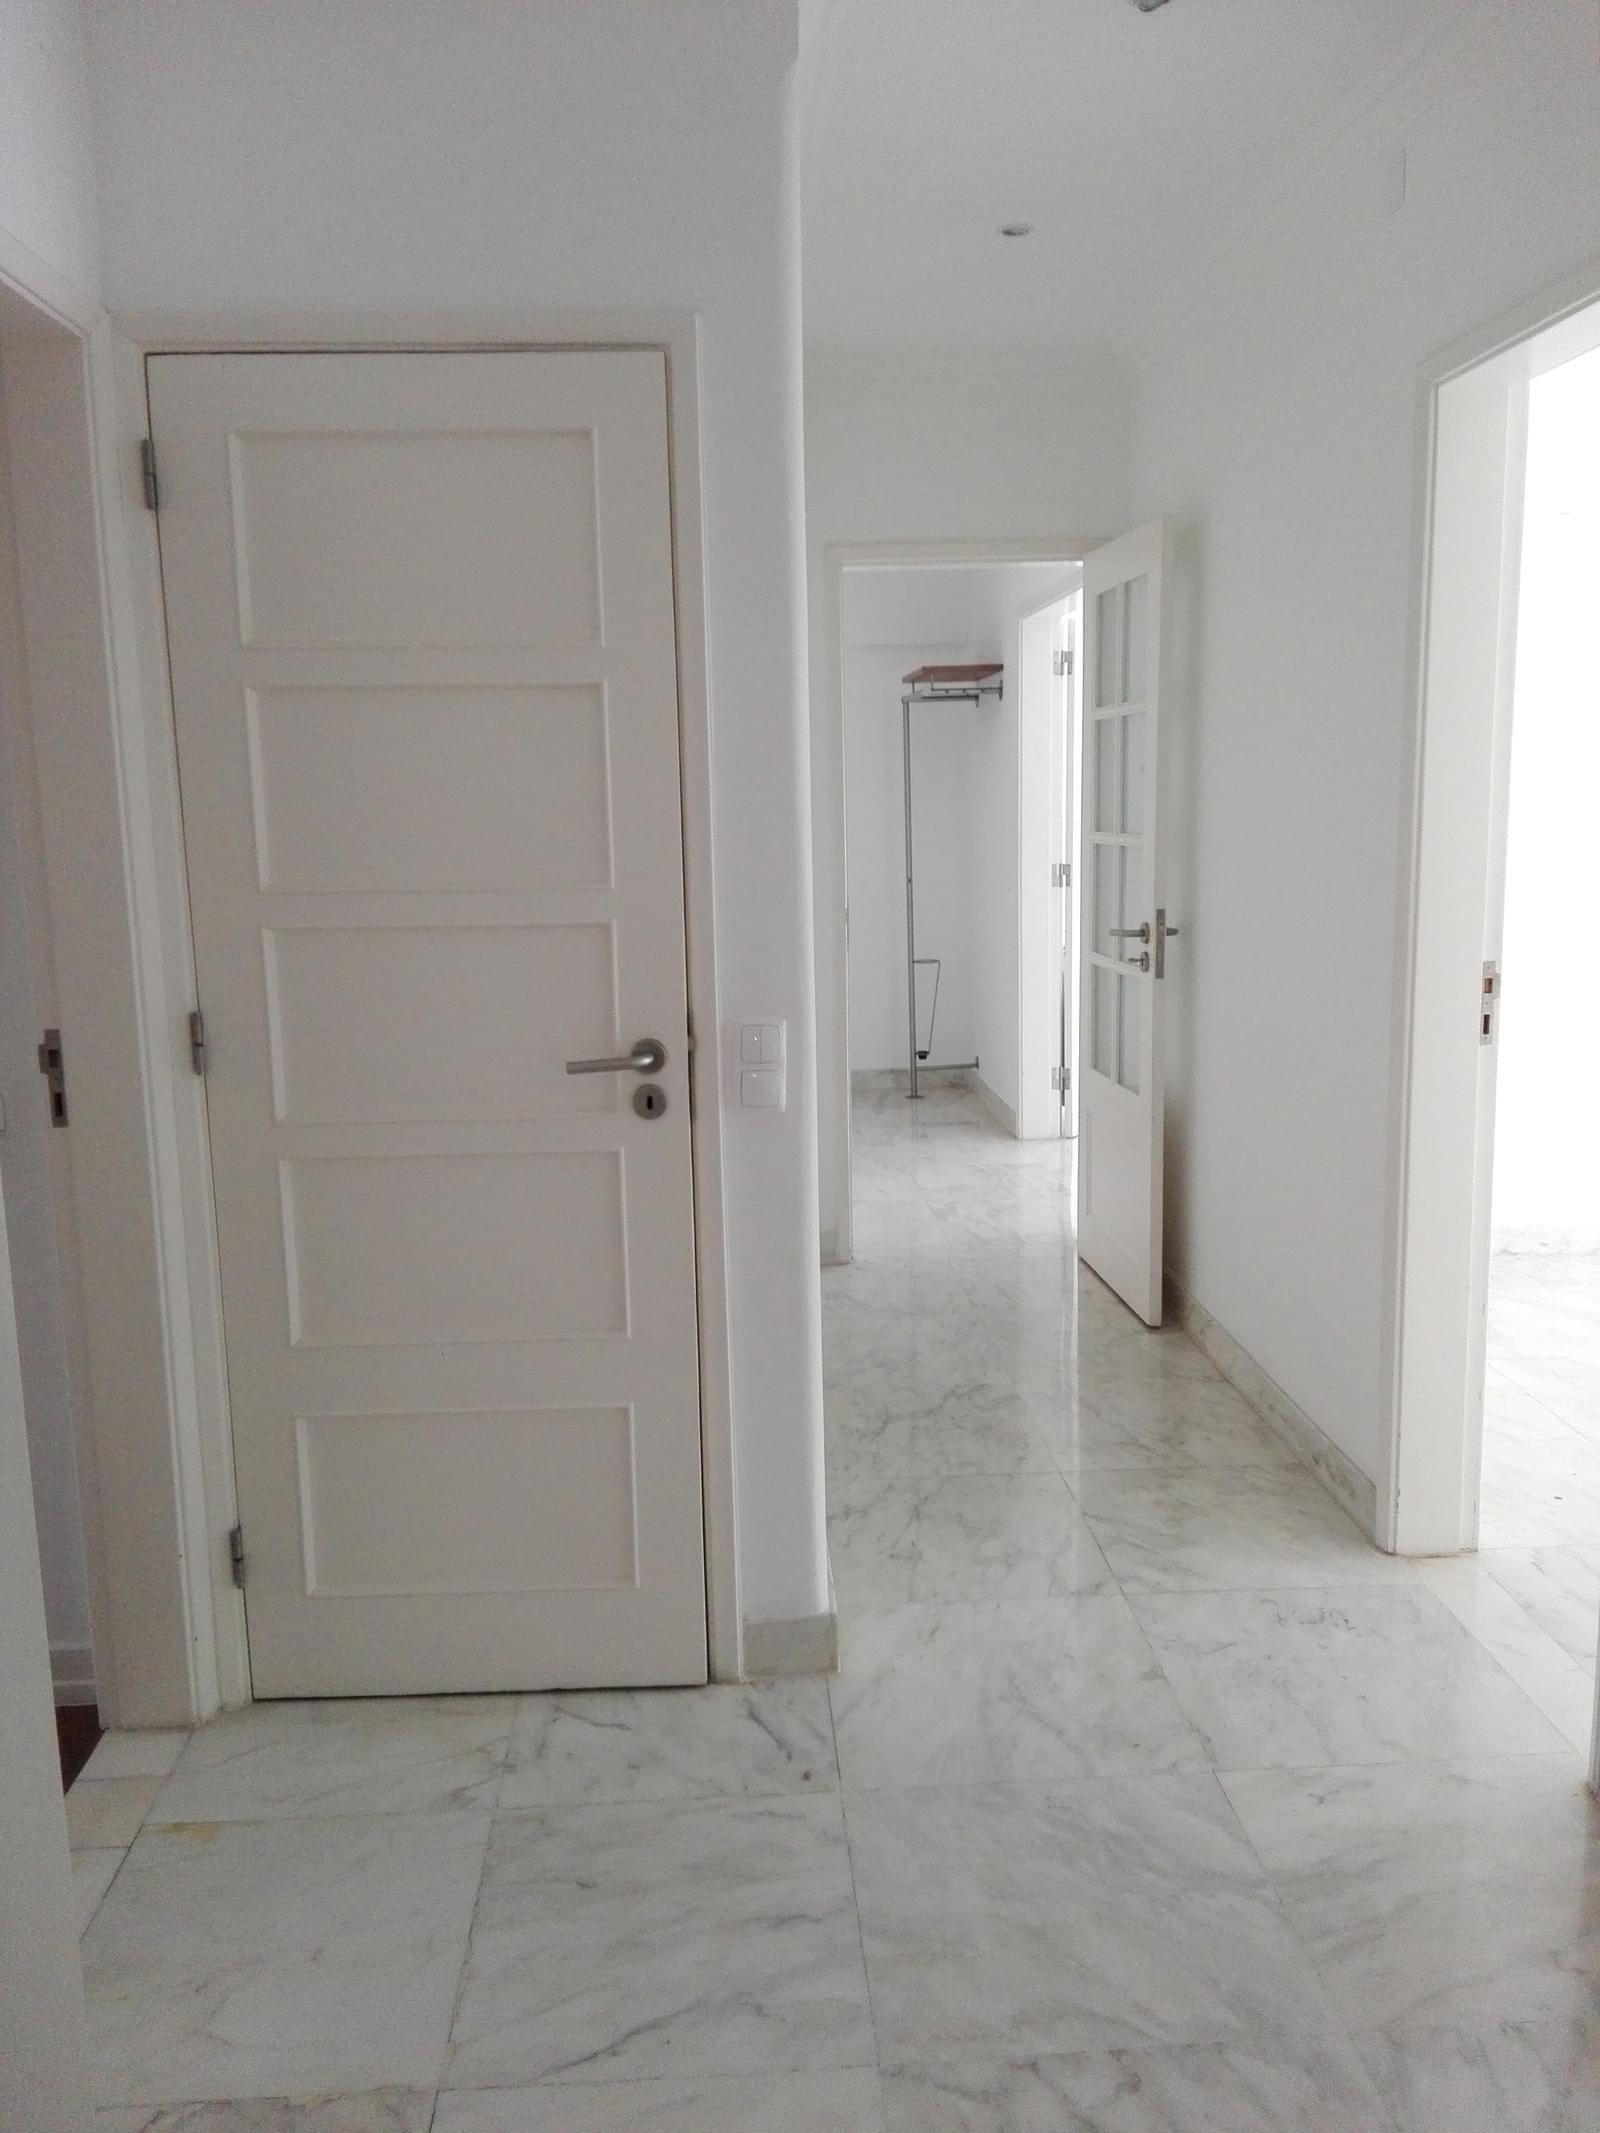 pf17056-apartamento-t4-1-lisboa-7fc2cae8-4c2f-4dc8-bb50-f78128723abb